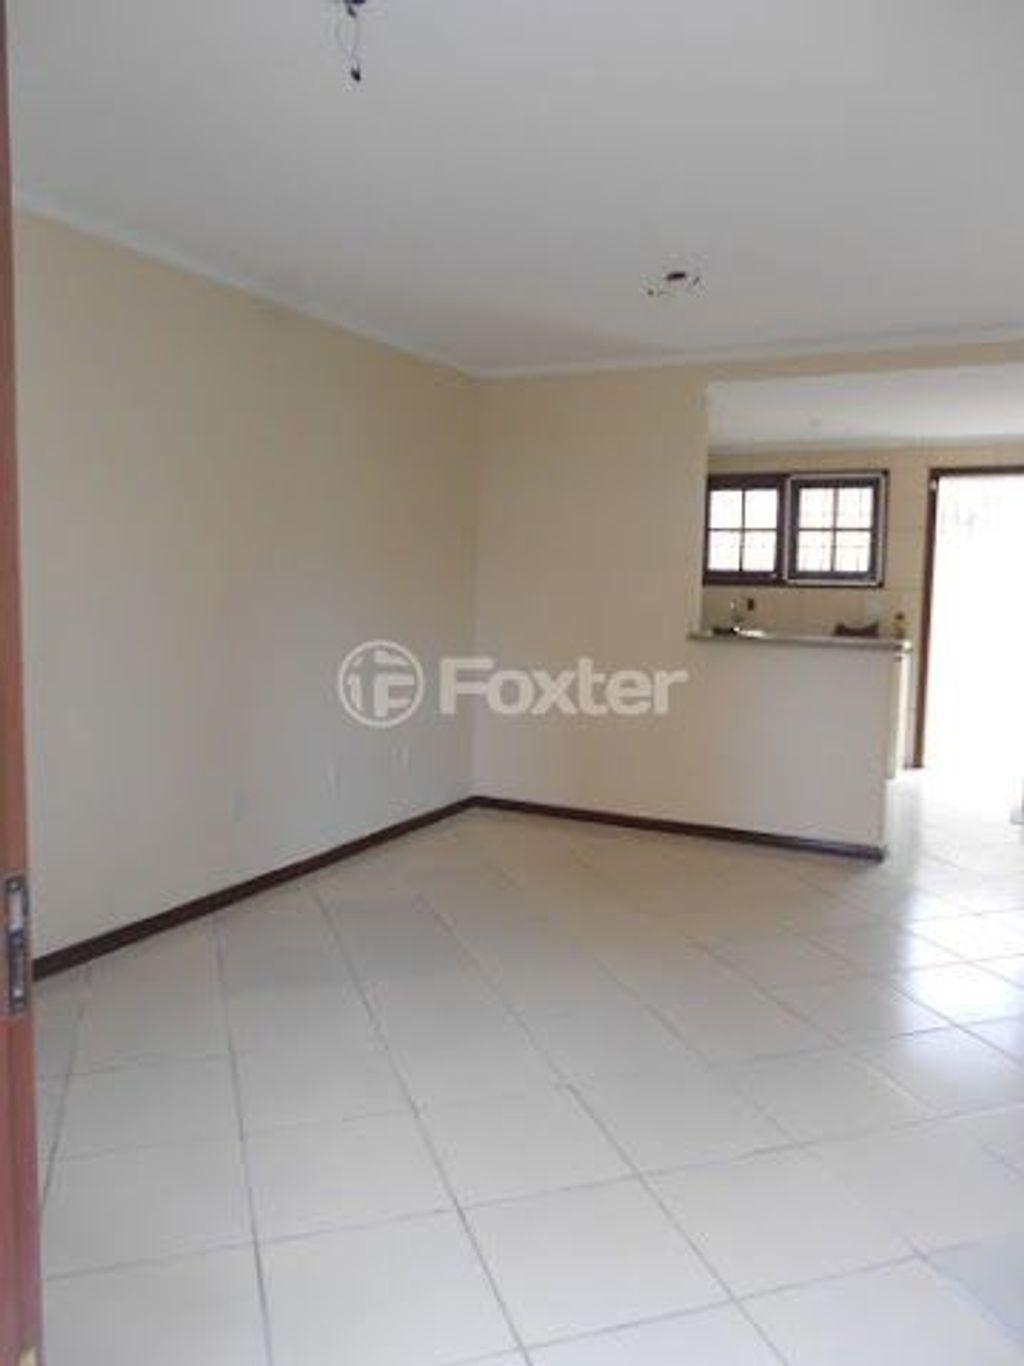 Casa 3 Dorm, Cavalhada, Porto Alegre (143368) - Foto 4